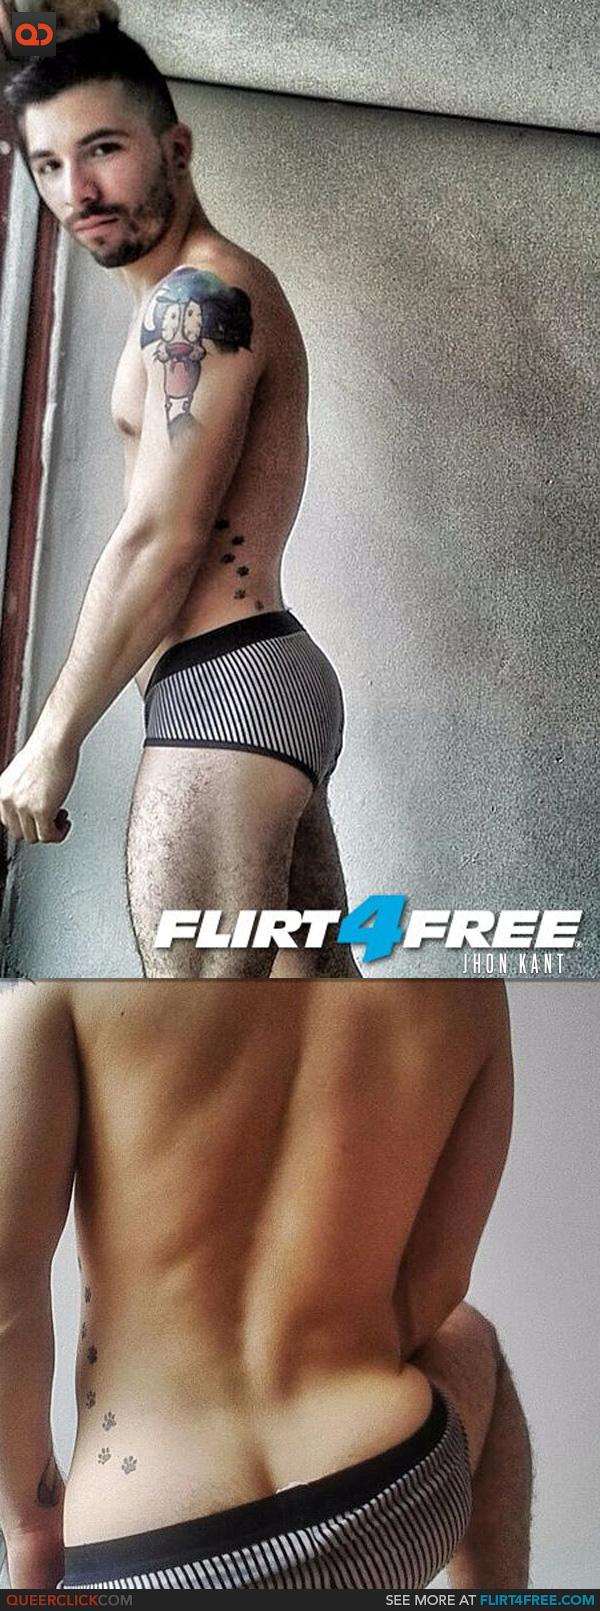 flirt4free-jhonkant